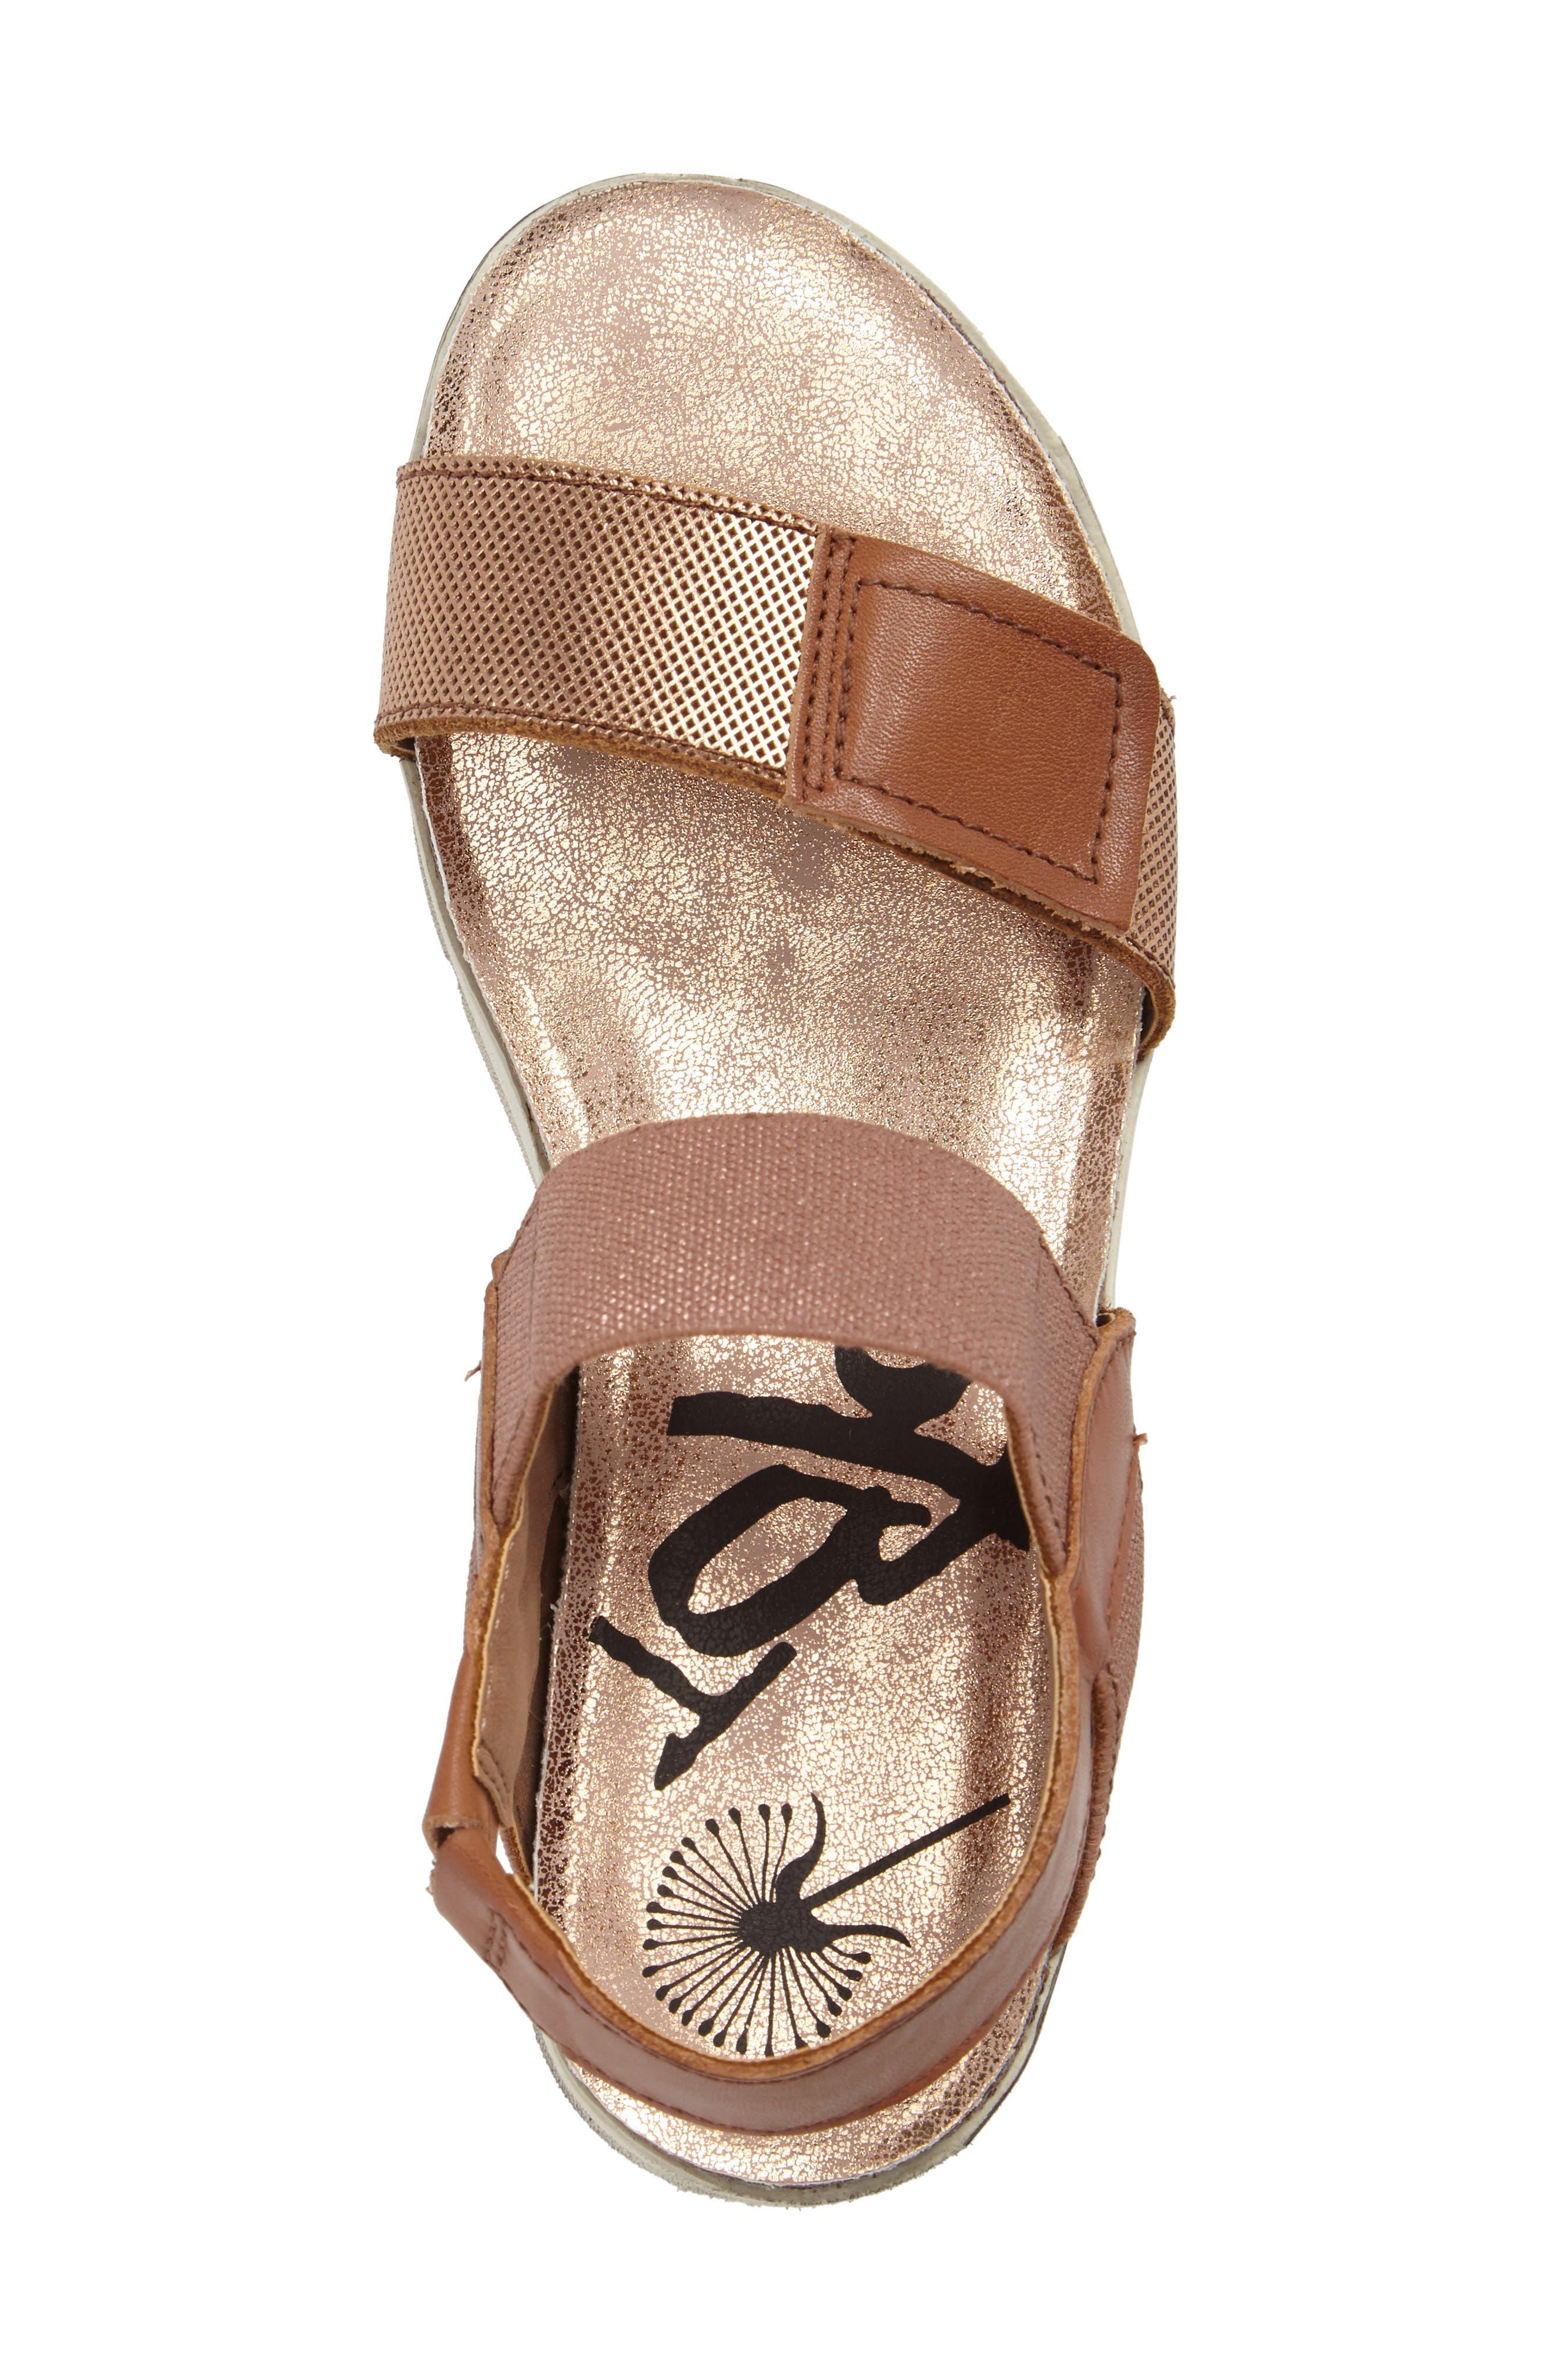 Nova Platform Sandal,                             Alternate thumbnail 5, color,                             Copper Leather